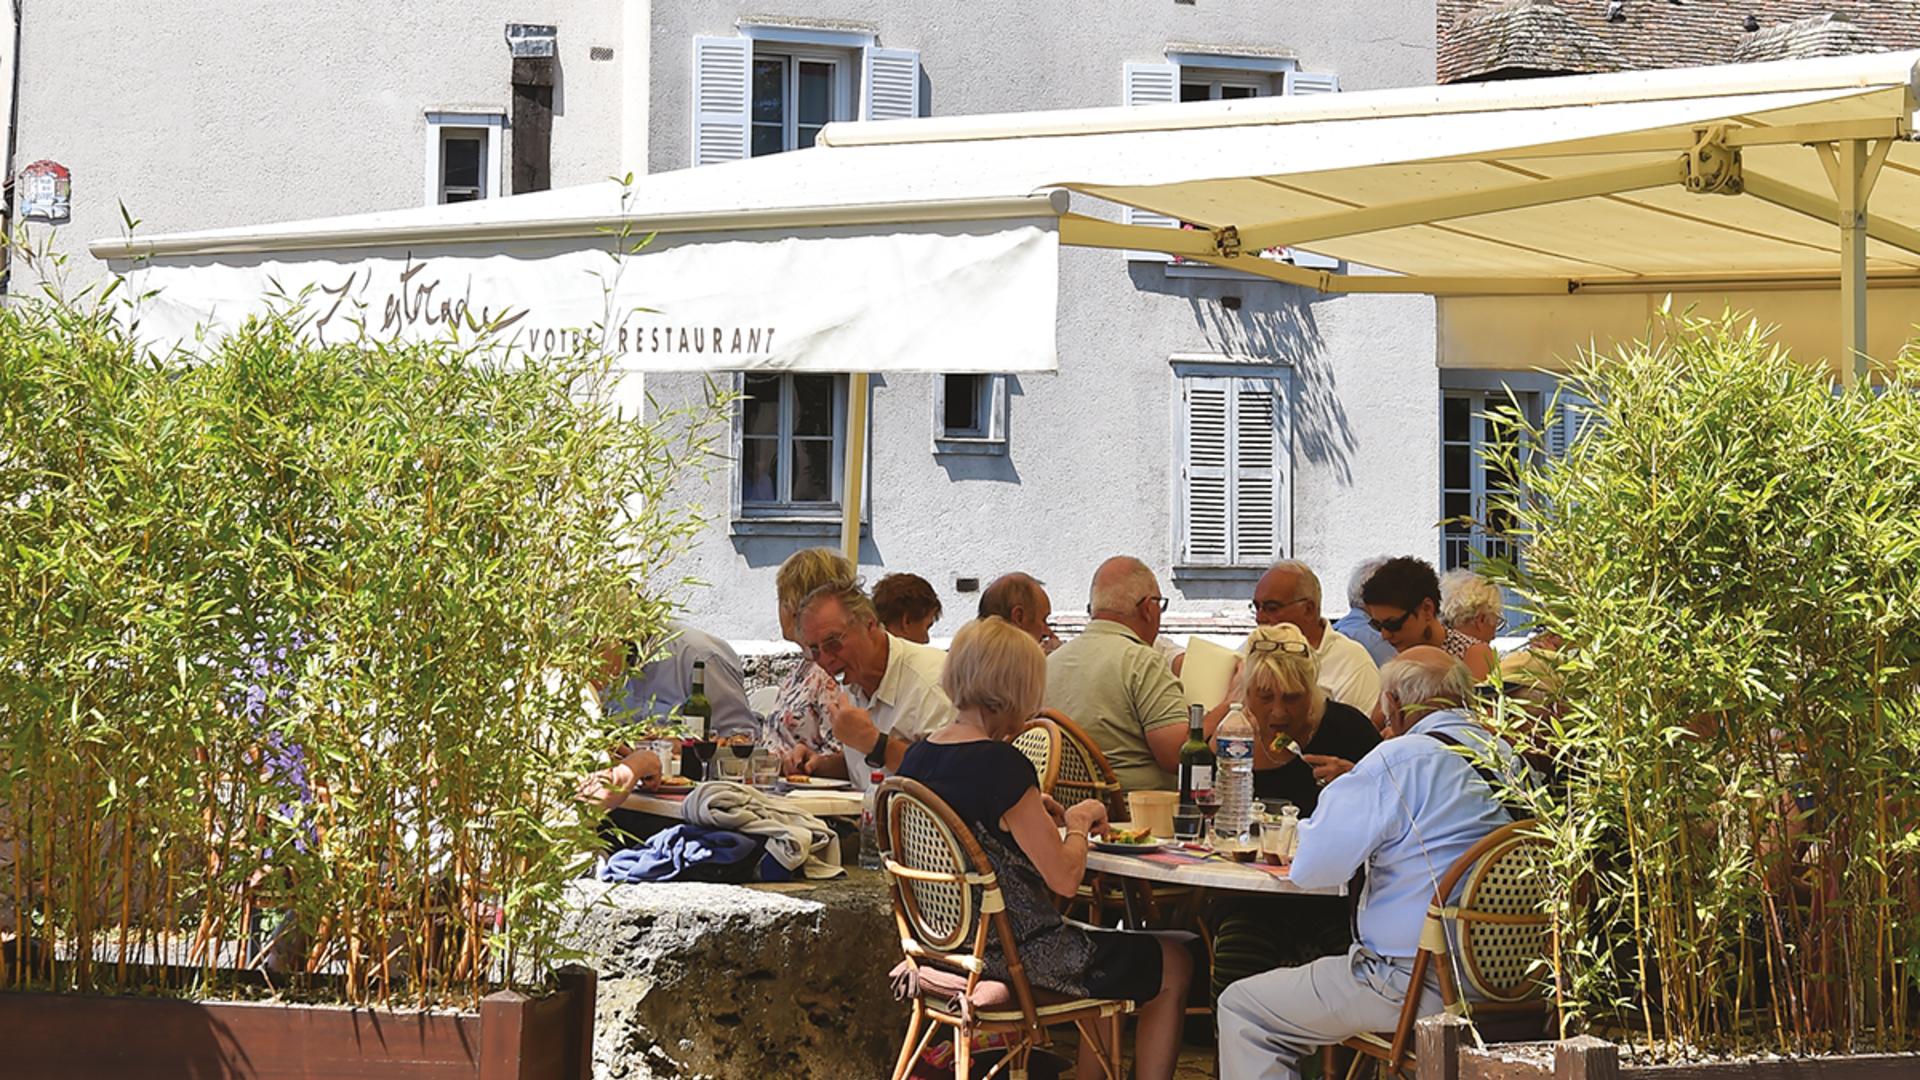 Restaurant à Chartres